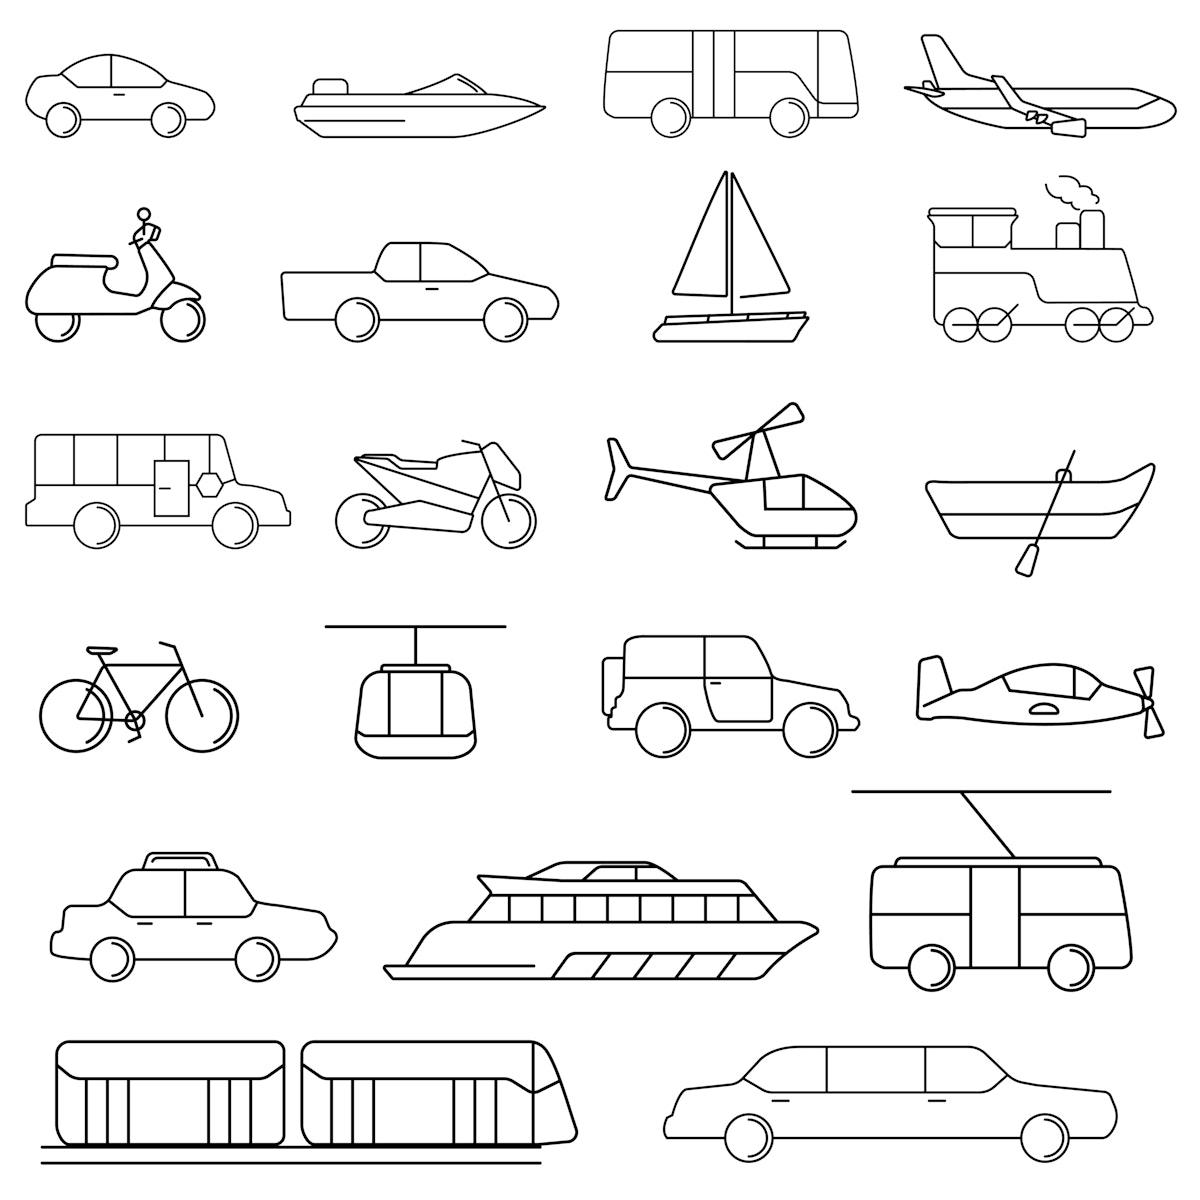 Vector of various transportation vehicles